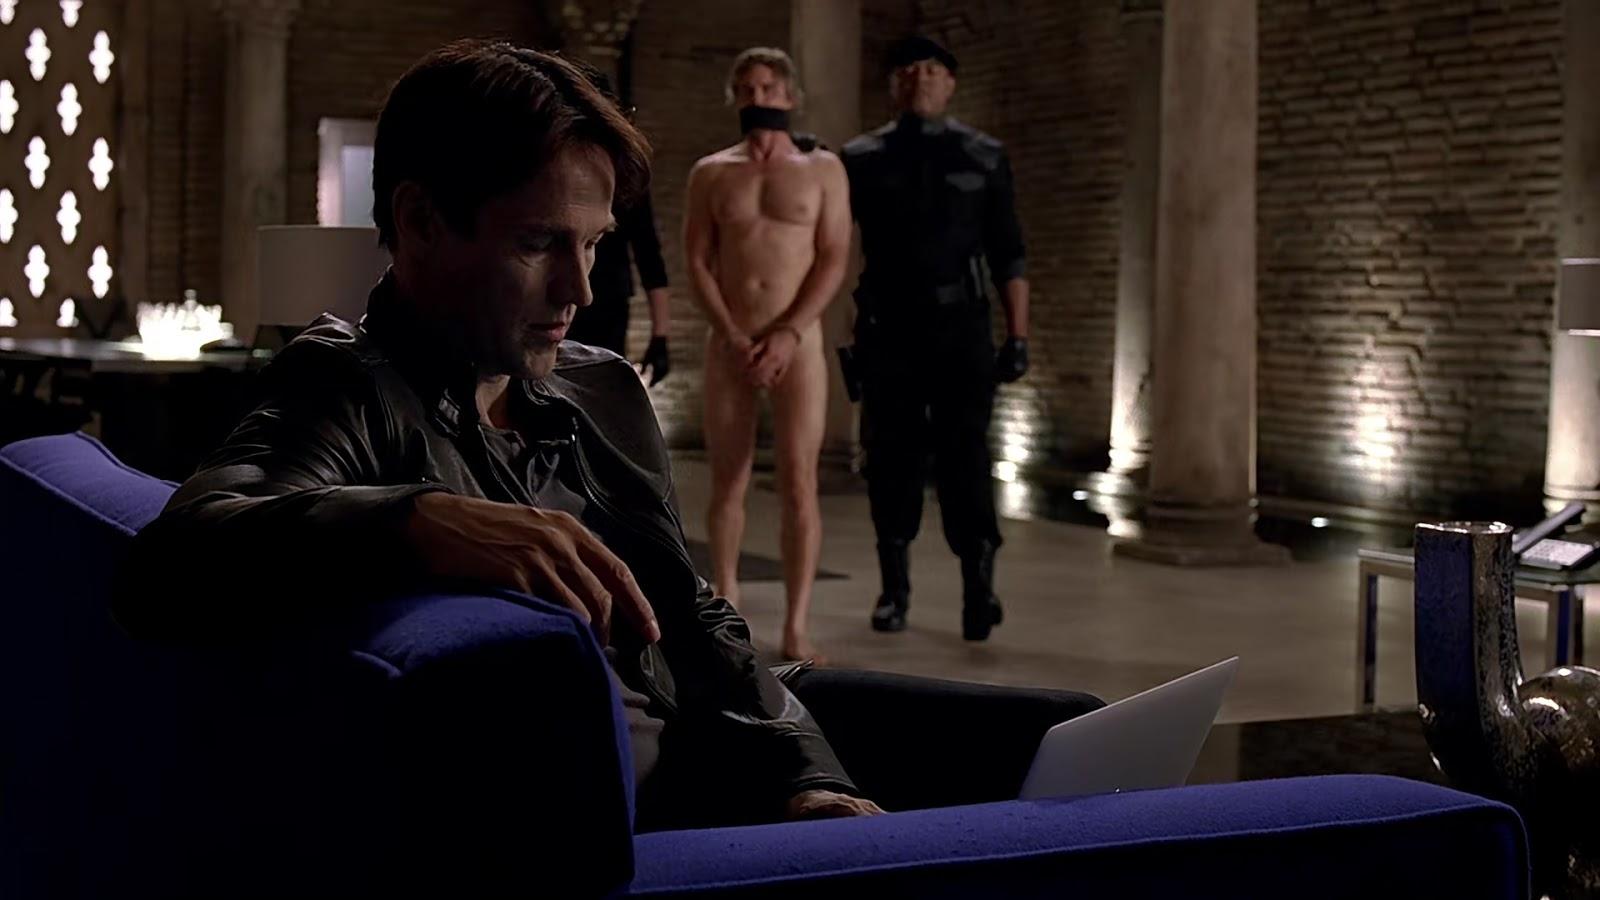 Nude ass sex images